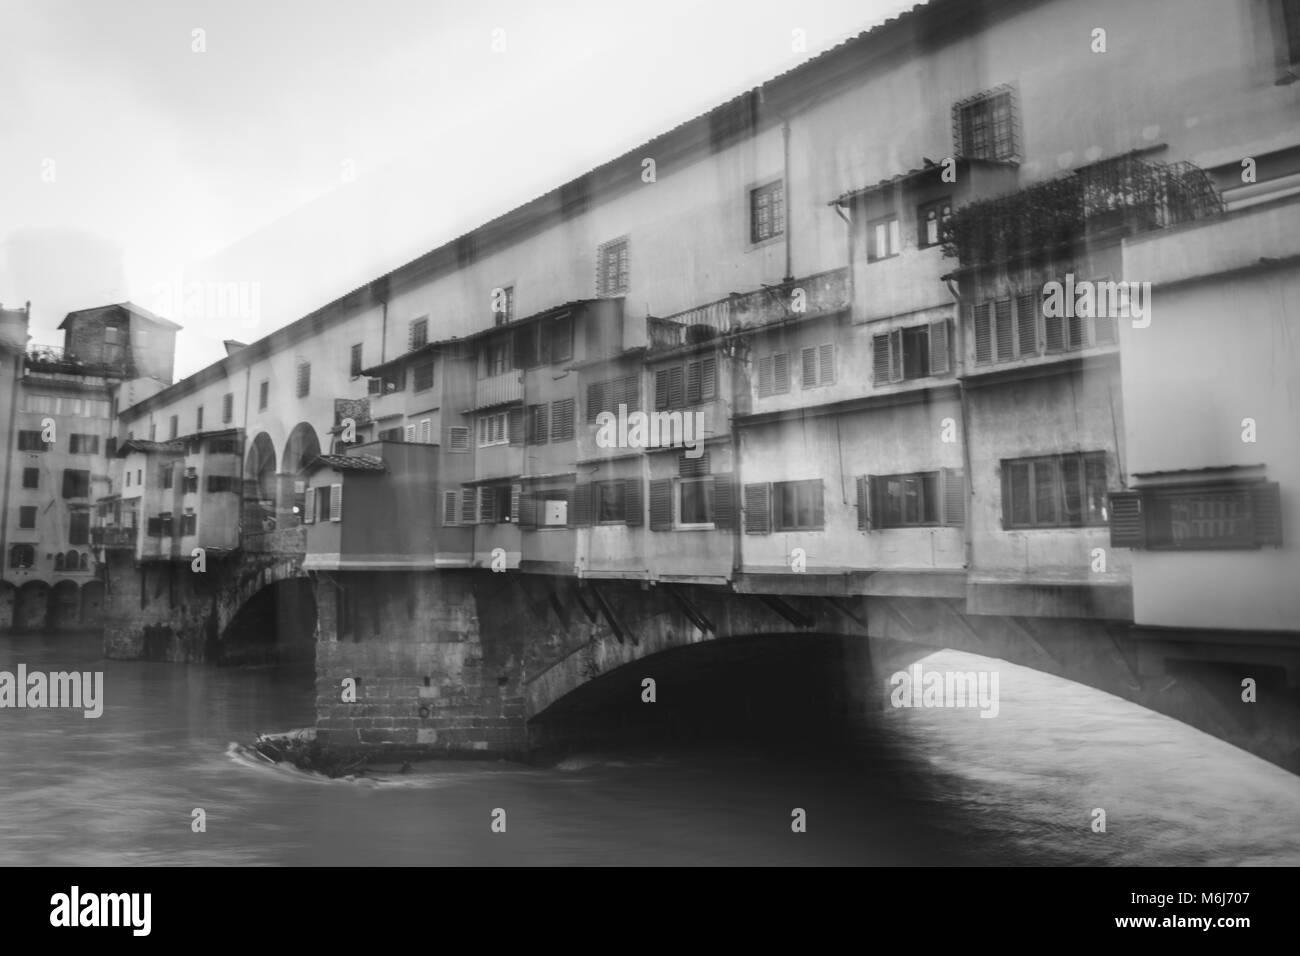 Blurry vision of Ponte Vecchio, blurry vision headache concept. - Stock Image